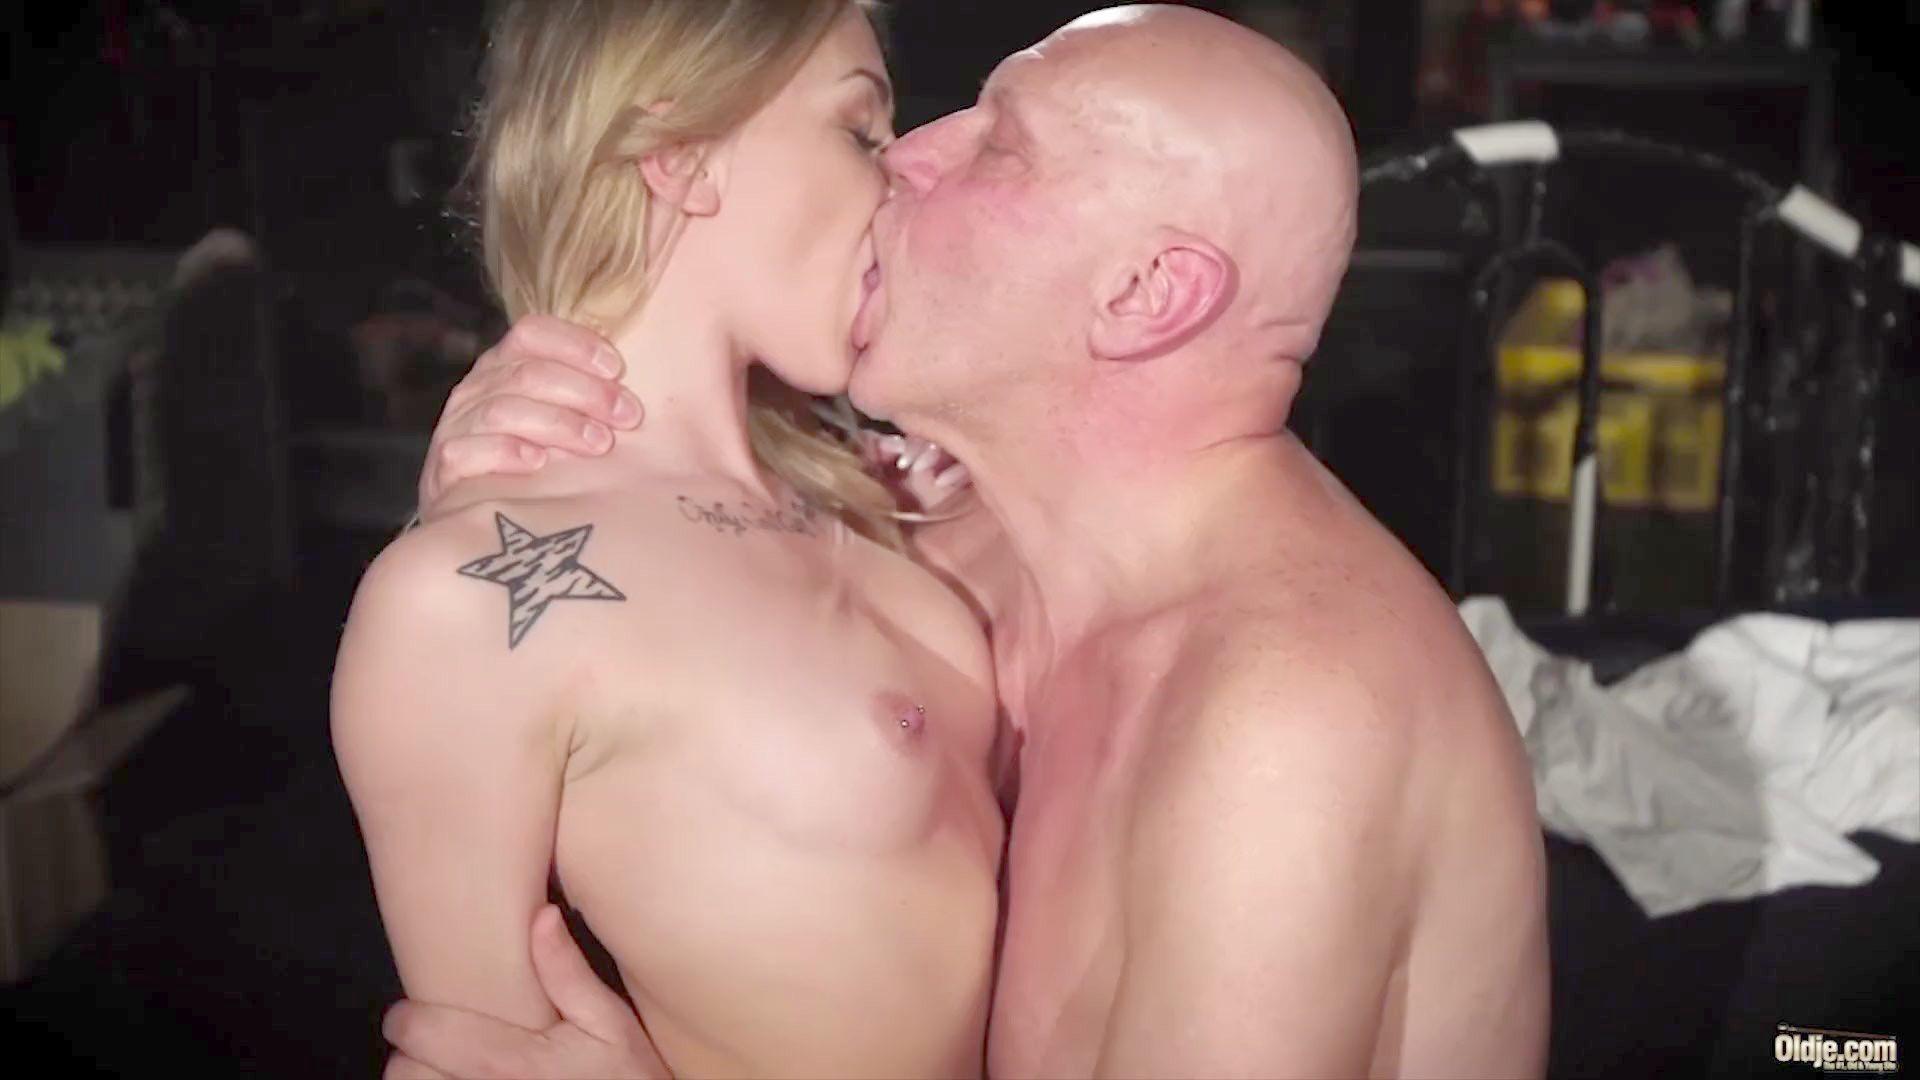 bf sex vidios play